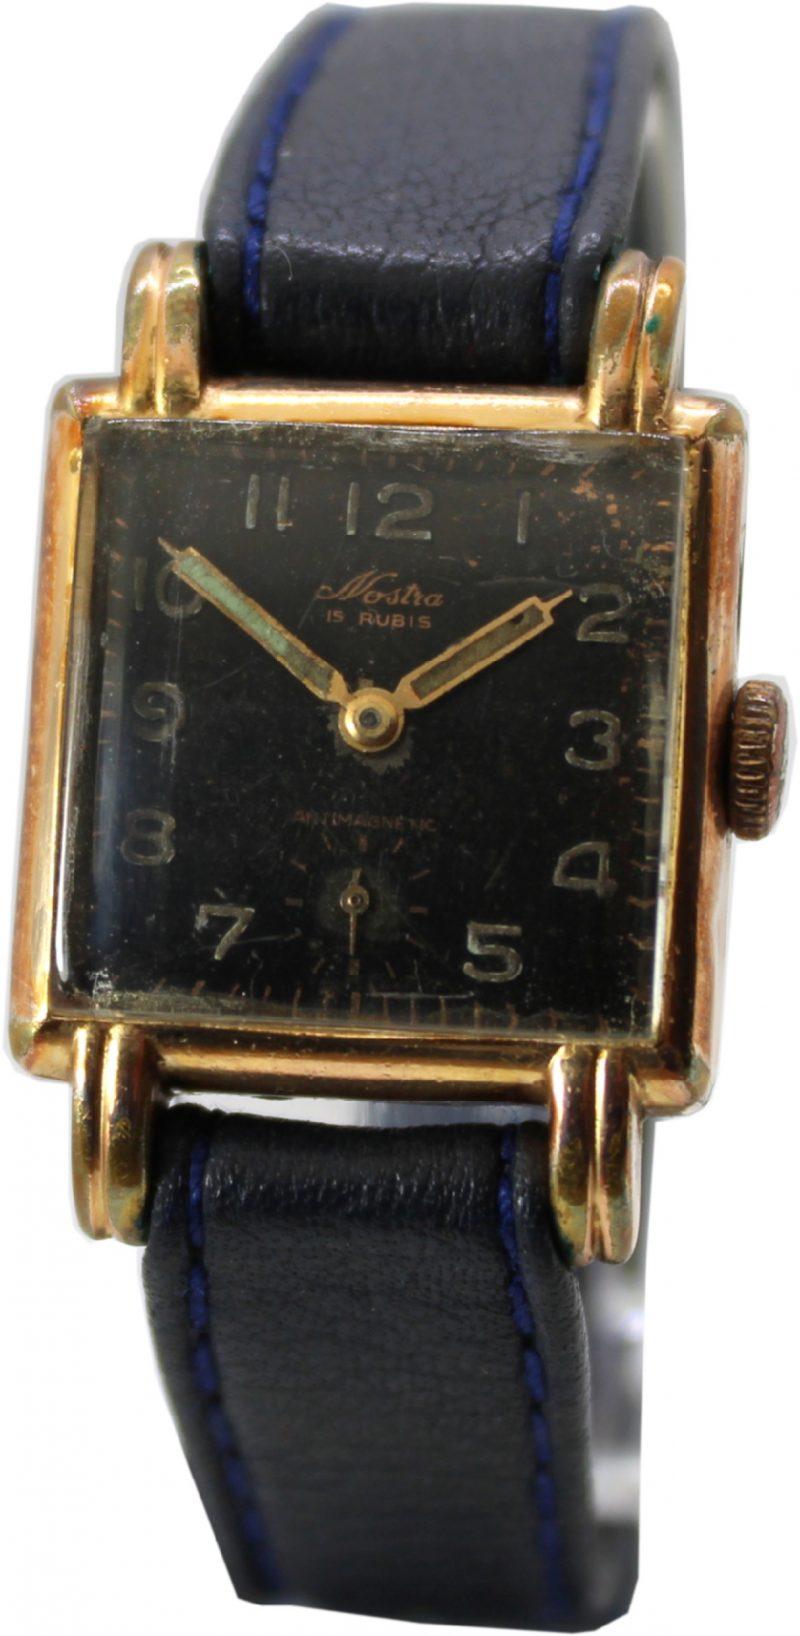 Nostra Herrenuhr Handaufzug 15 Rubis 20 Mikron vergoldet Lederband dunkelblau